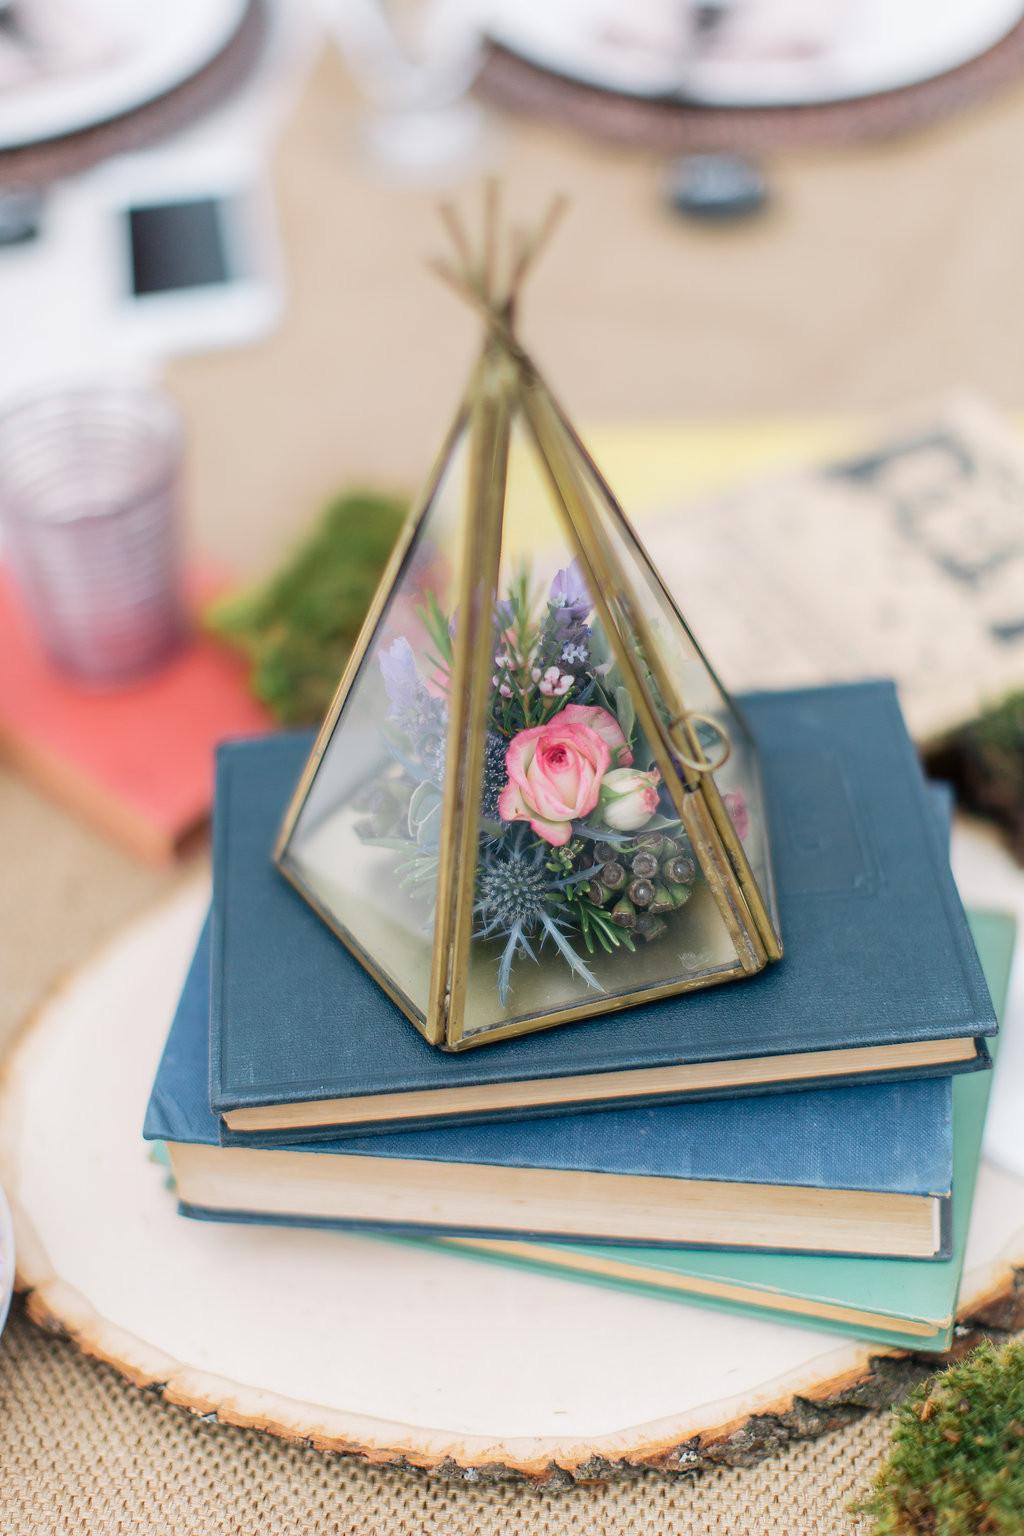 Los Angeles Wedding Florist - Spring Curiousities